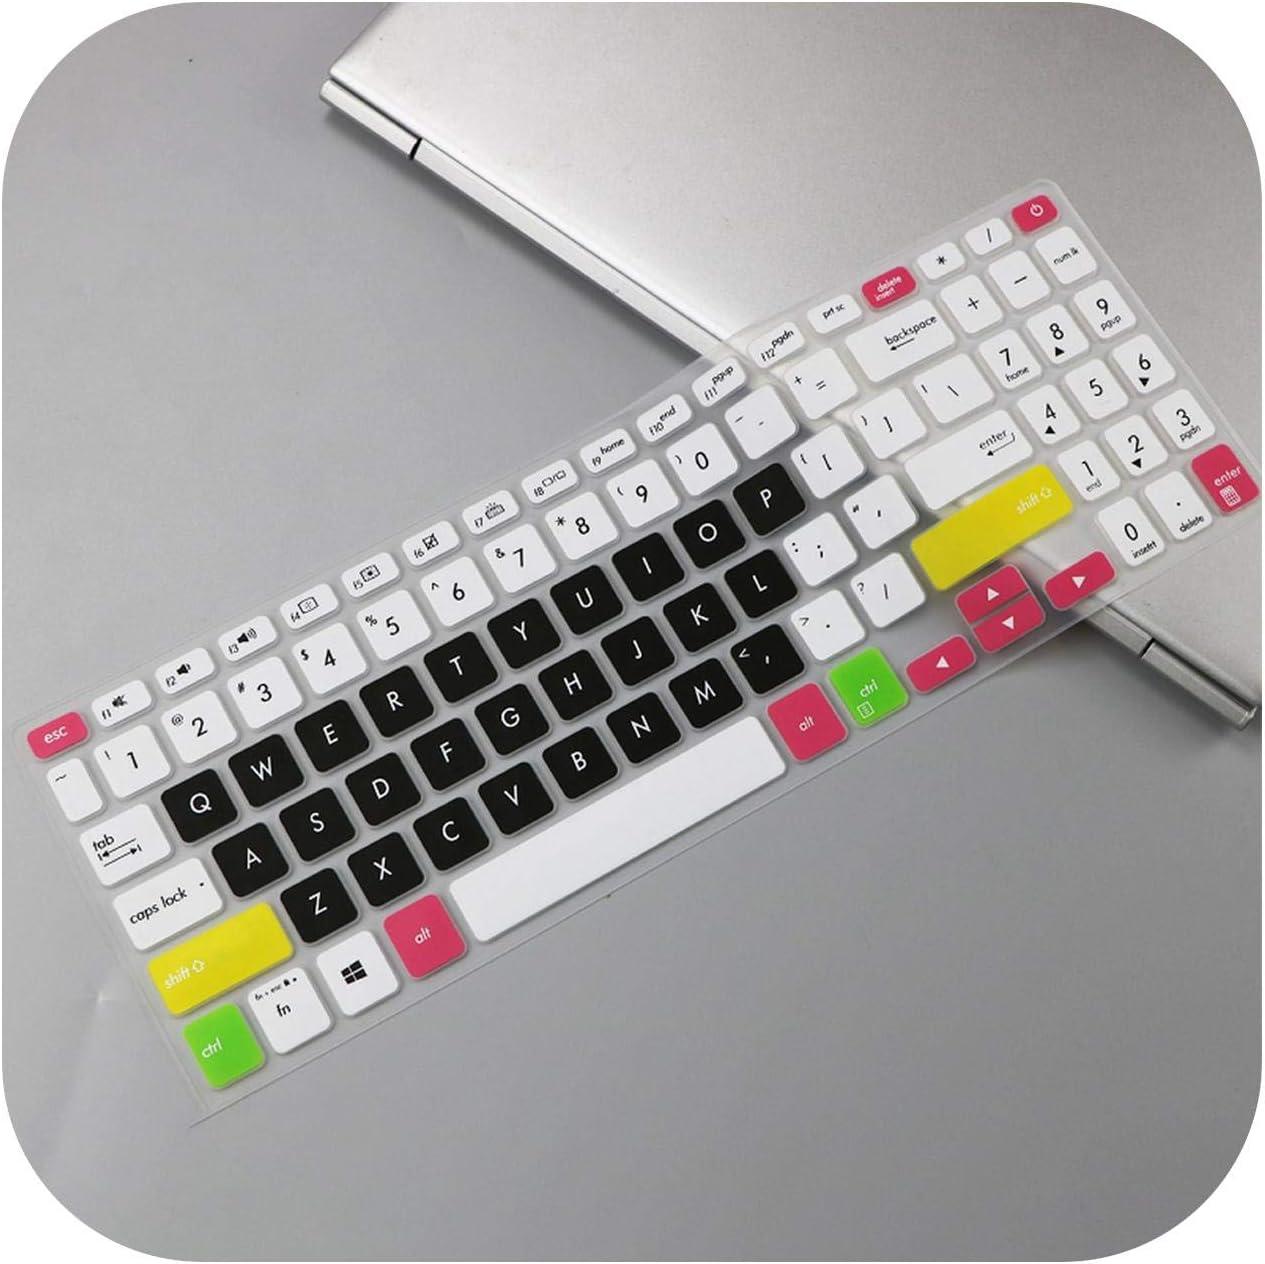 for Asus Vivobook S15 S530Un S530F S530Fn S530Ua S530Uf S530Fa S530U S530 Un Ua 15.6 Inch Keyboard Protector Skin Cover-Candyblue